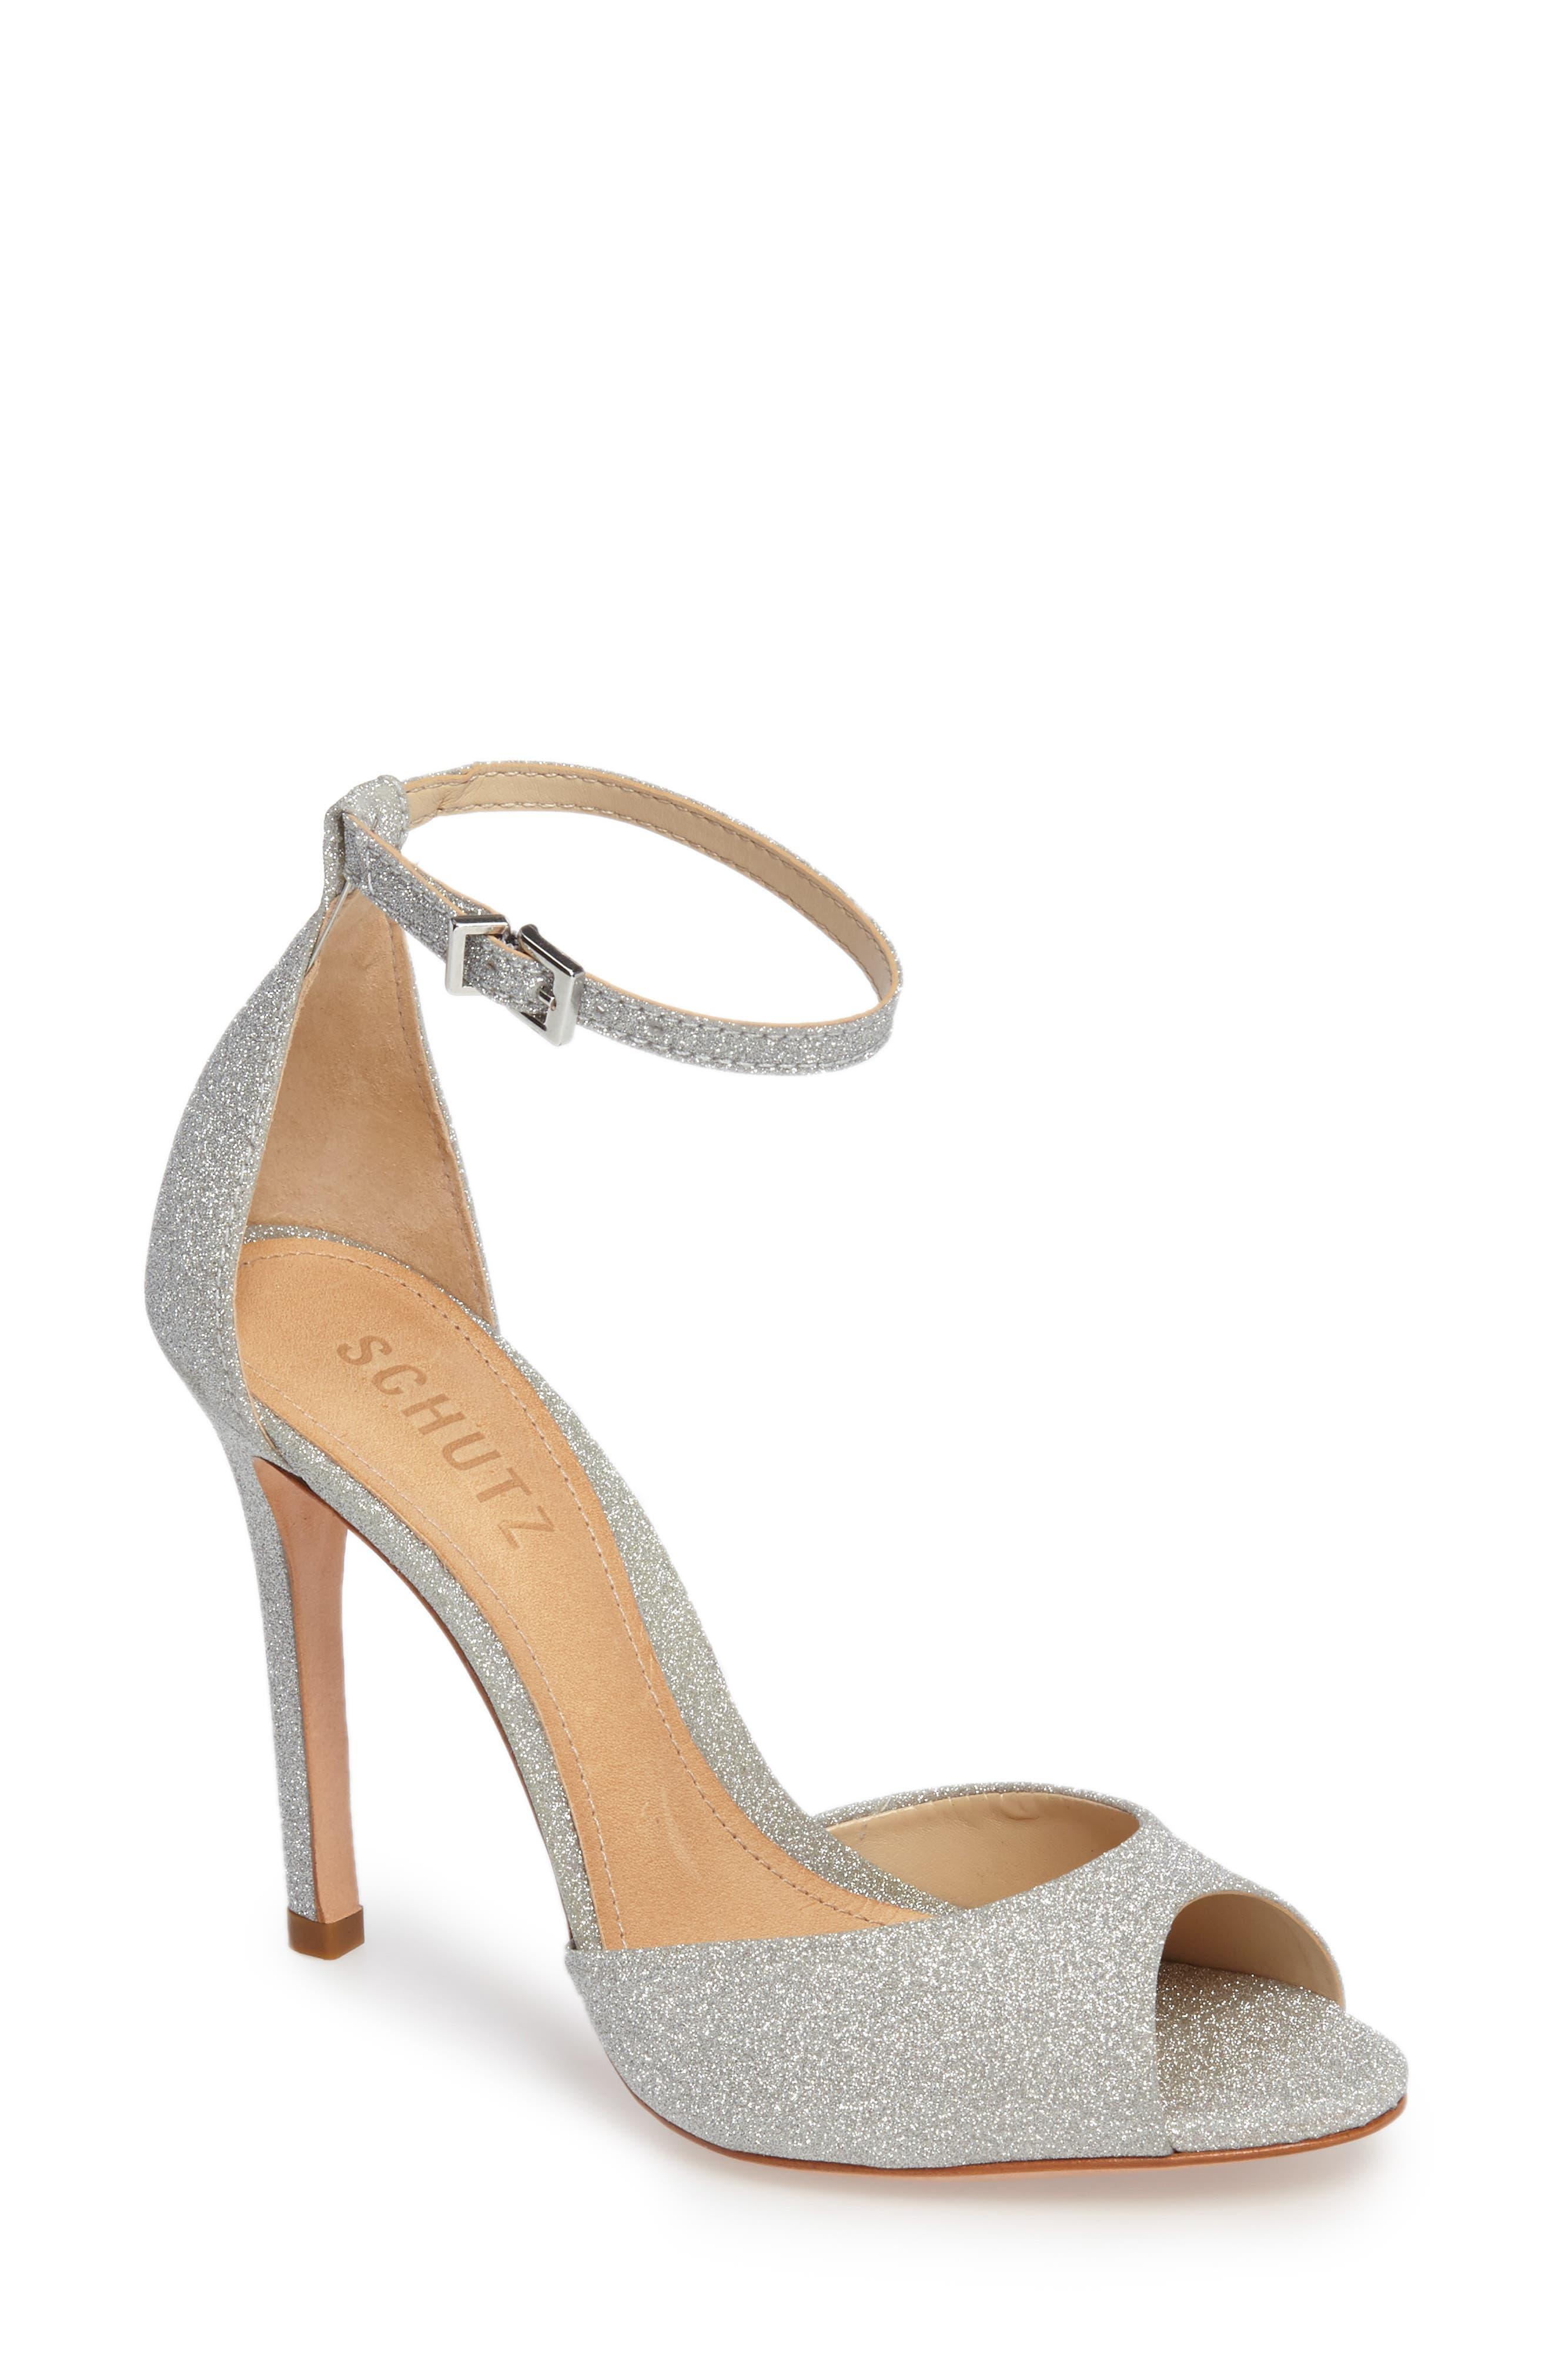 SCHUTZ Saasha Lee Ankle Strap Sandal